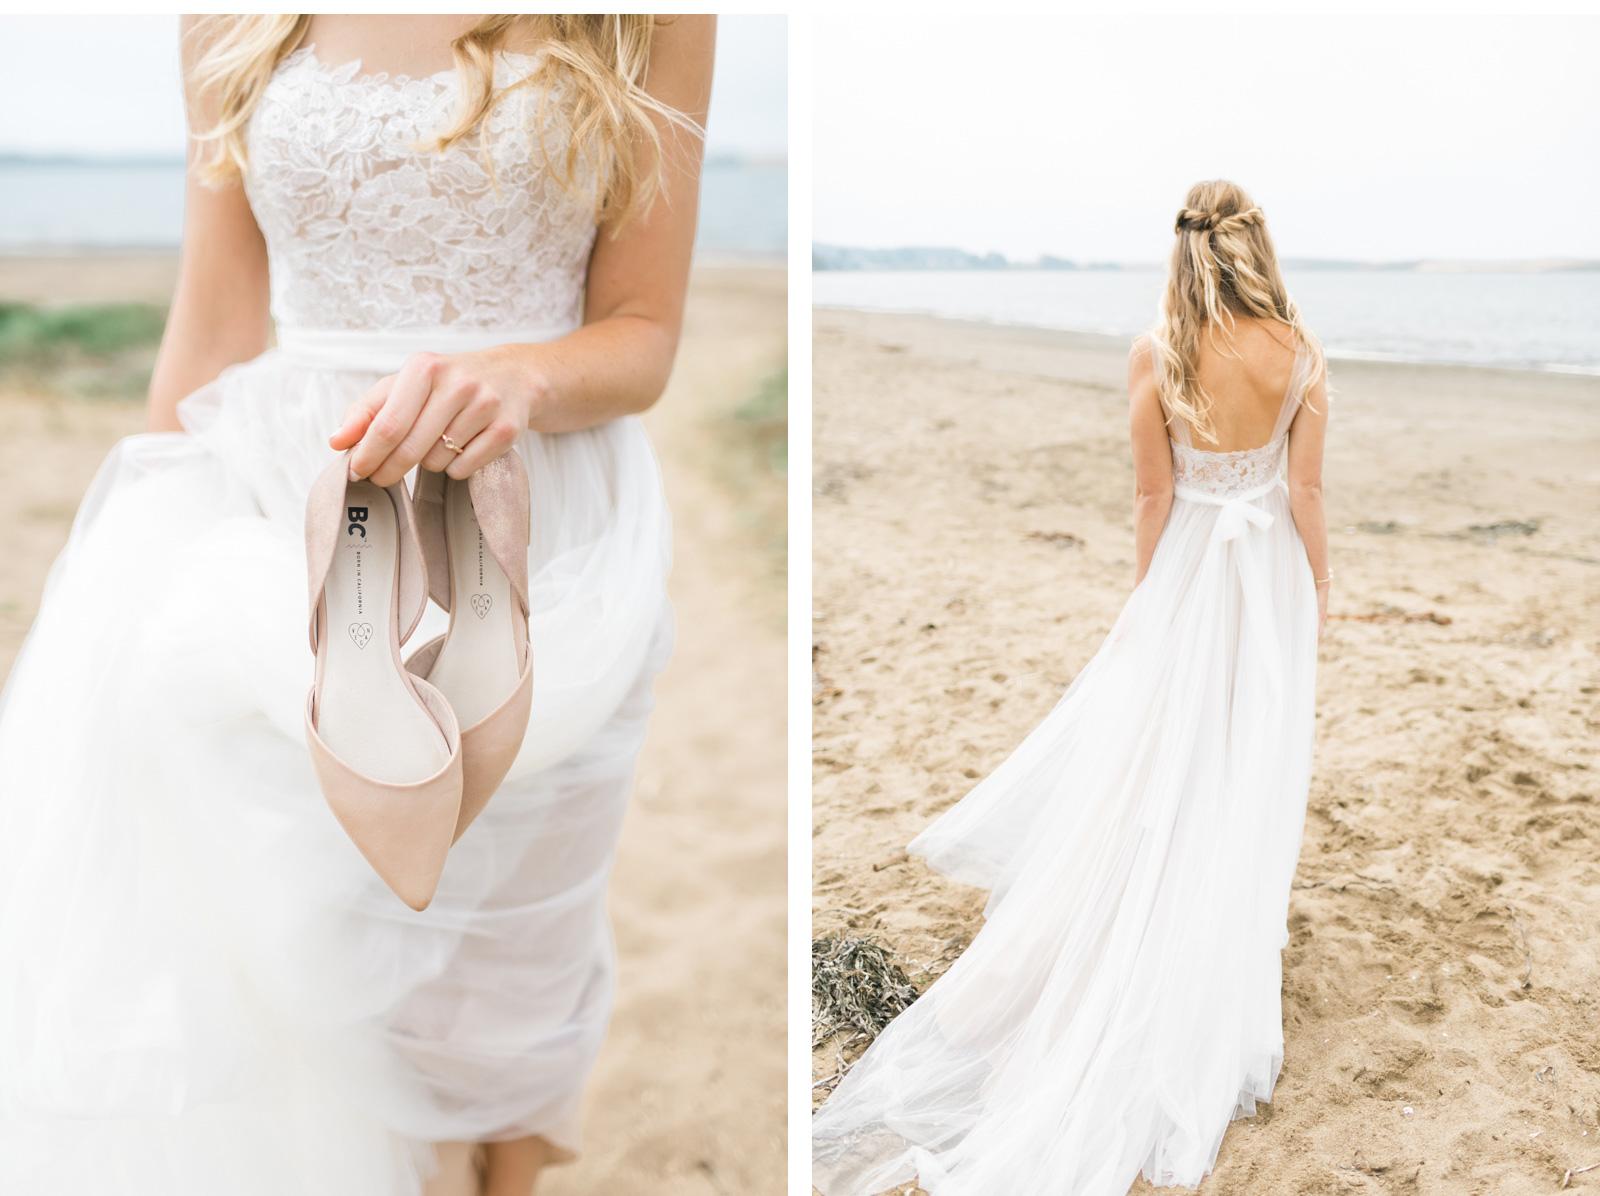 San-Luis-Obispo-Wedding-Show-Me-Your-Mumu-Natalie-Schutt-Photography_06.jpg